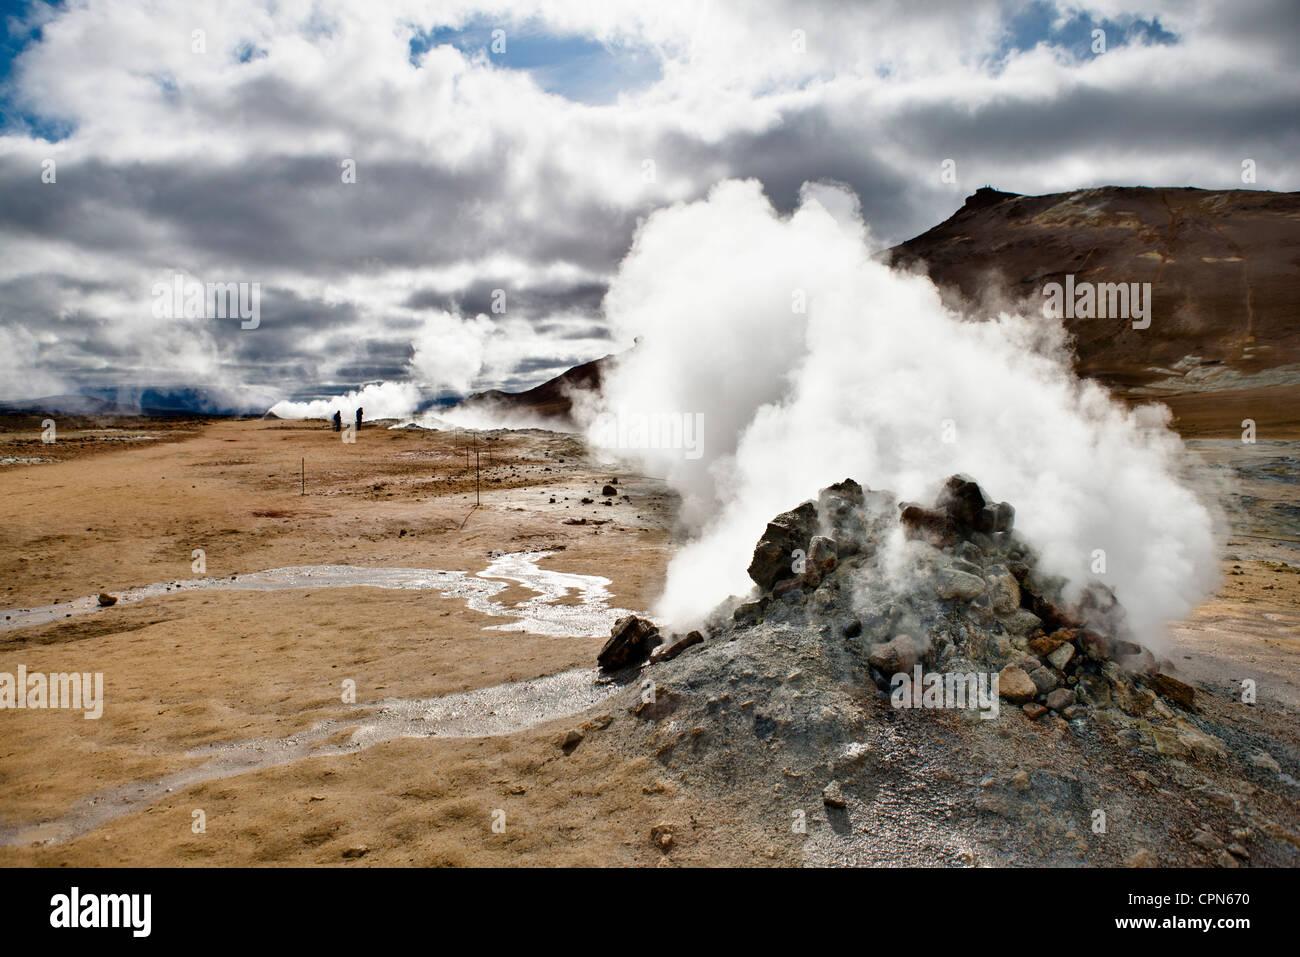 Island, Namafjall, Fumarole loslassen Dampf und Schwefel gas Stockbild